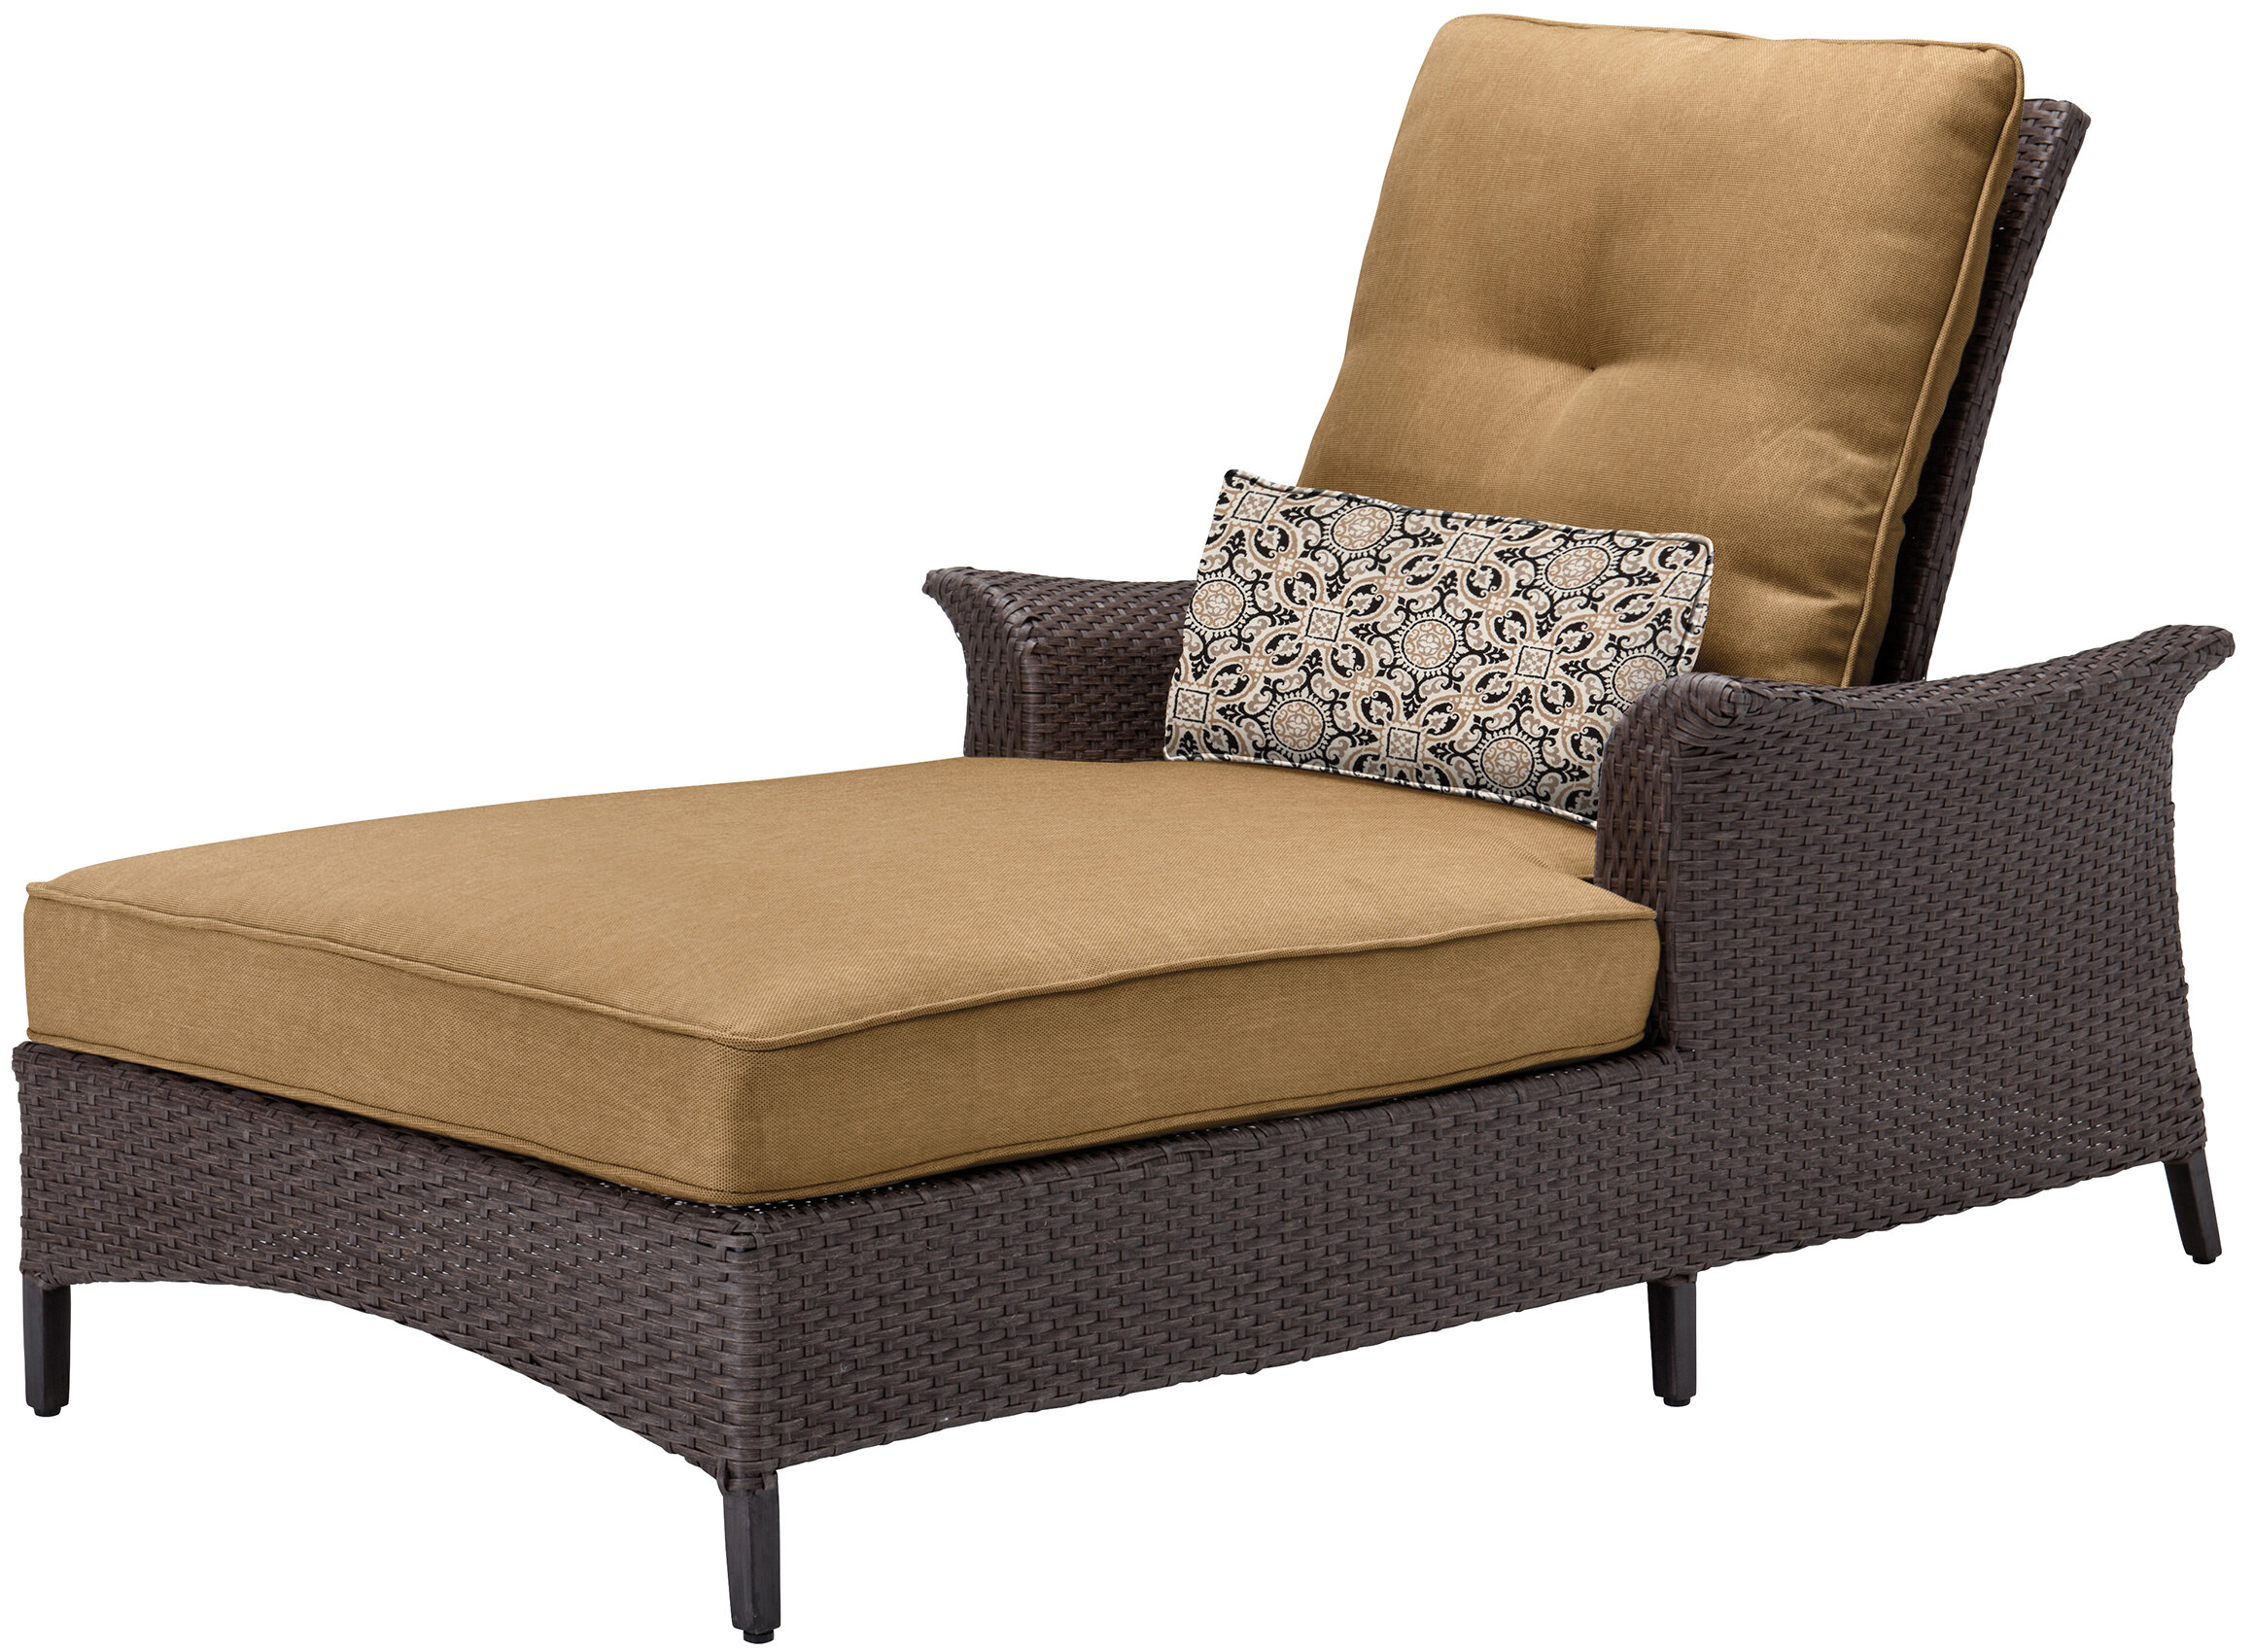 Merveilleux Daigle Reclining Chaise Lounge Chair With Cushion